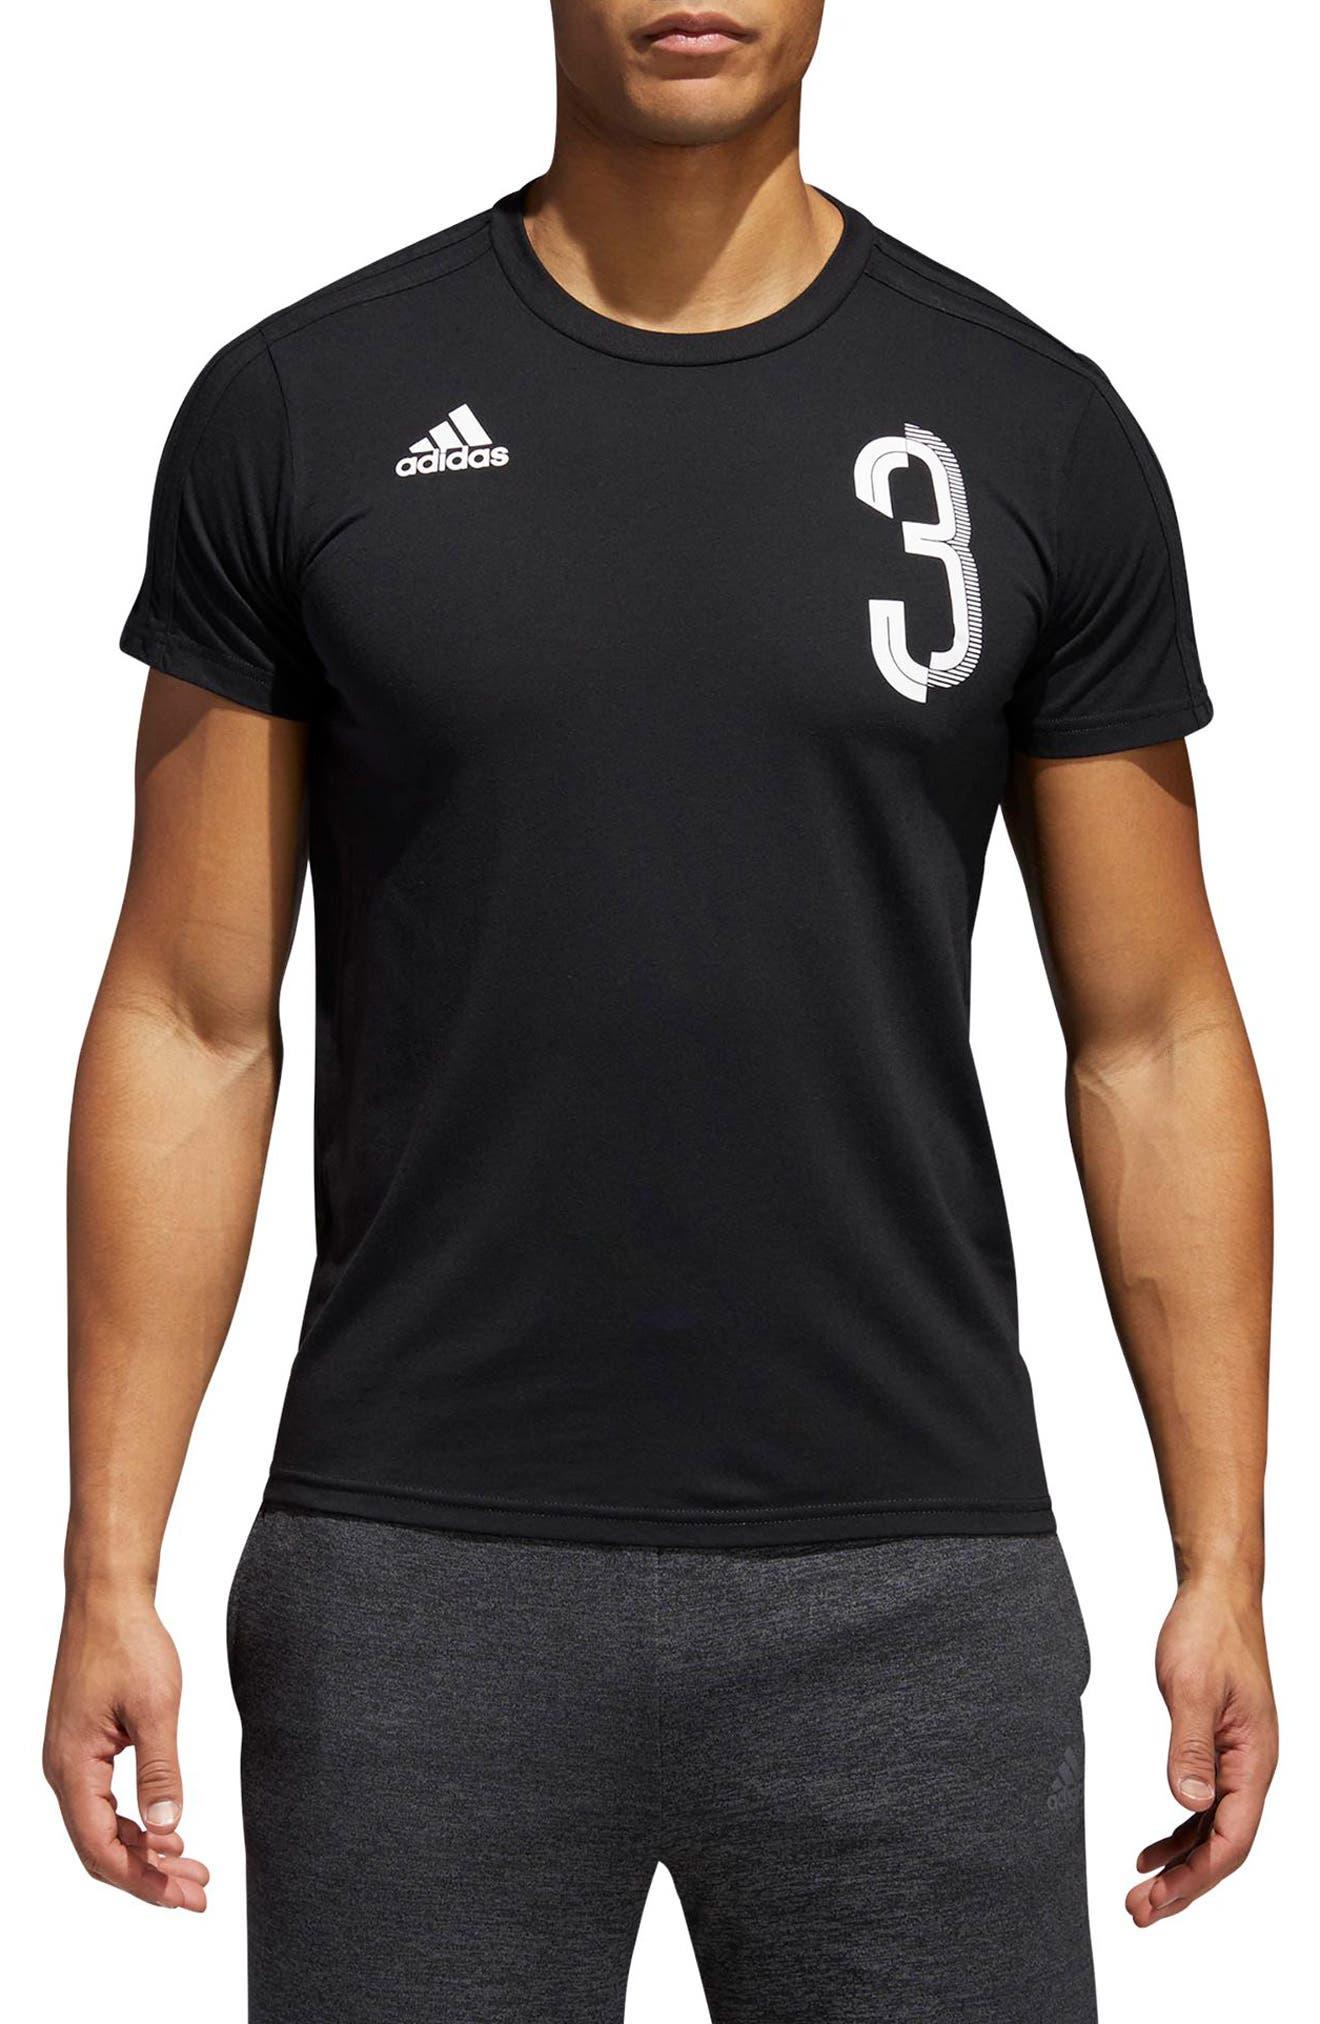 Soccer Slim Fit T-Shirt,                         Main,                         color, Black / White